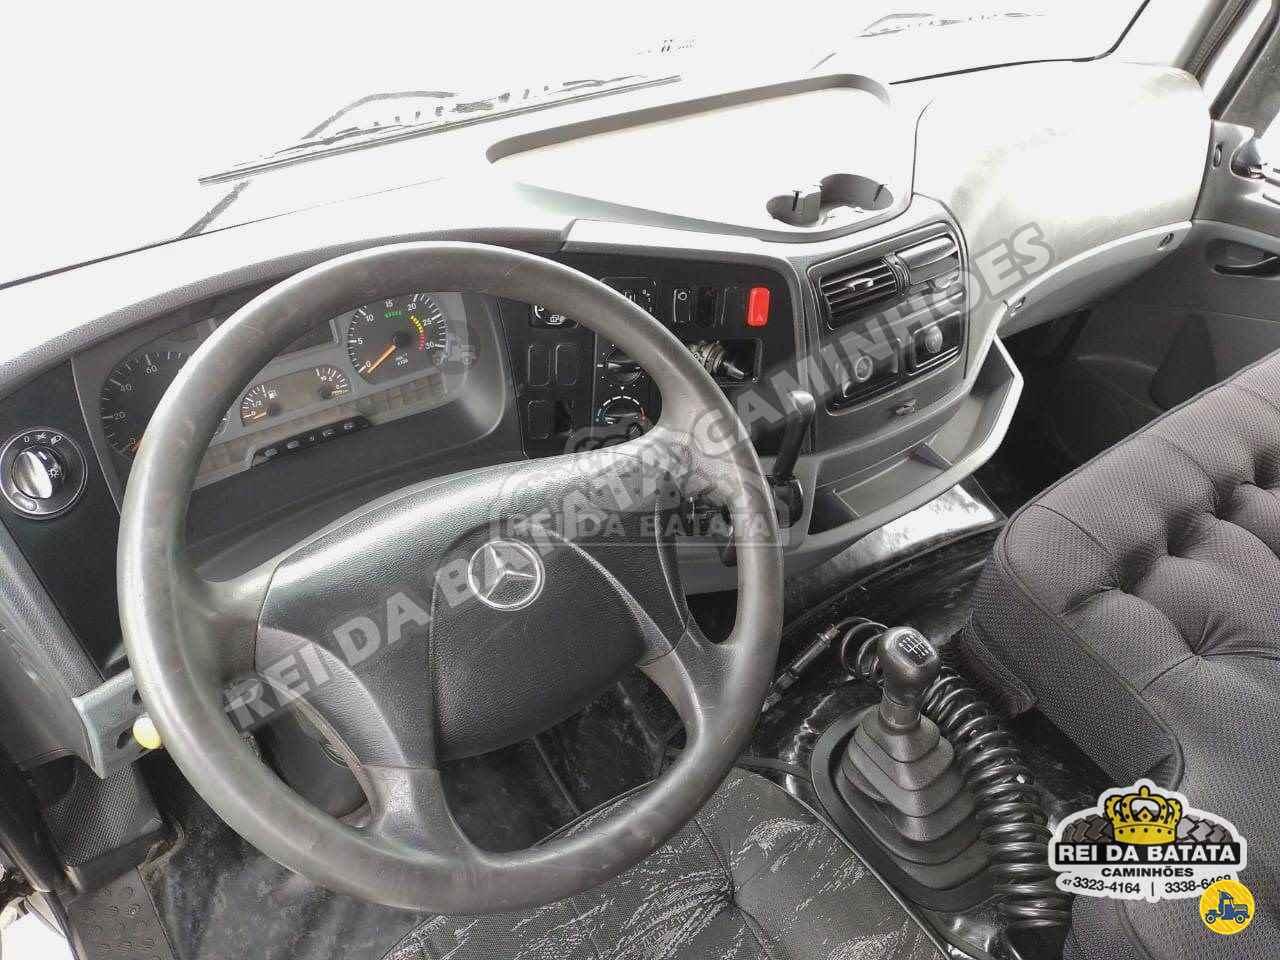 MERCEDES-BENZ MB 2428 875000km 2010/2010 Rei da Batata Caminhões